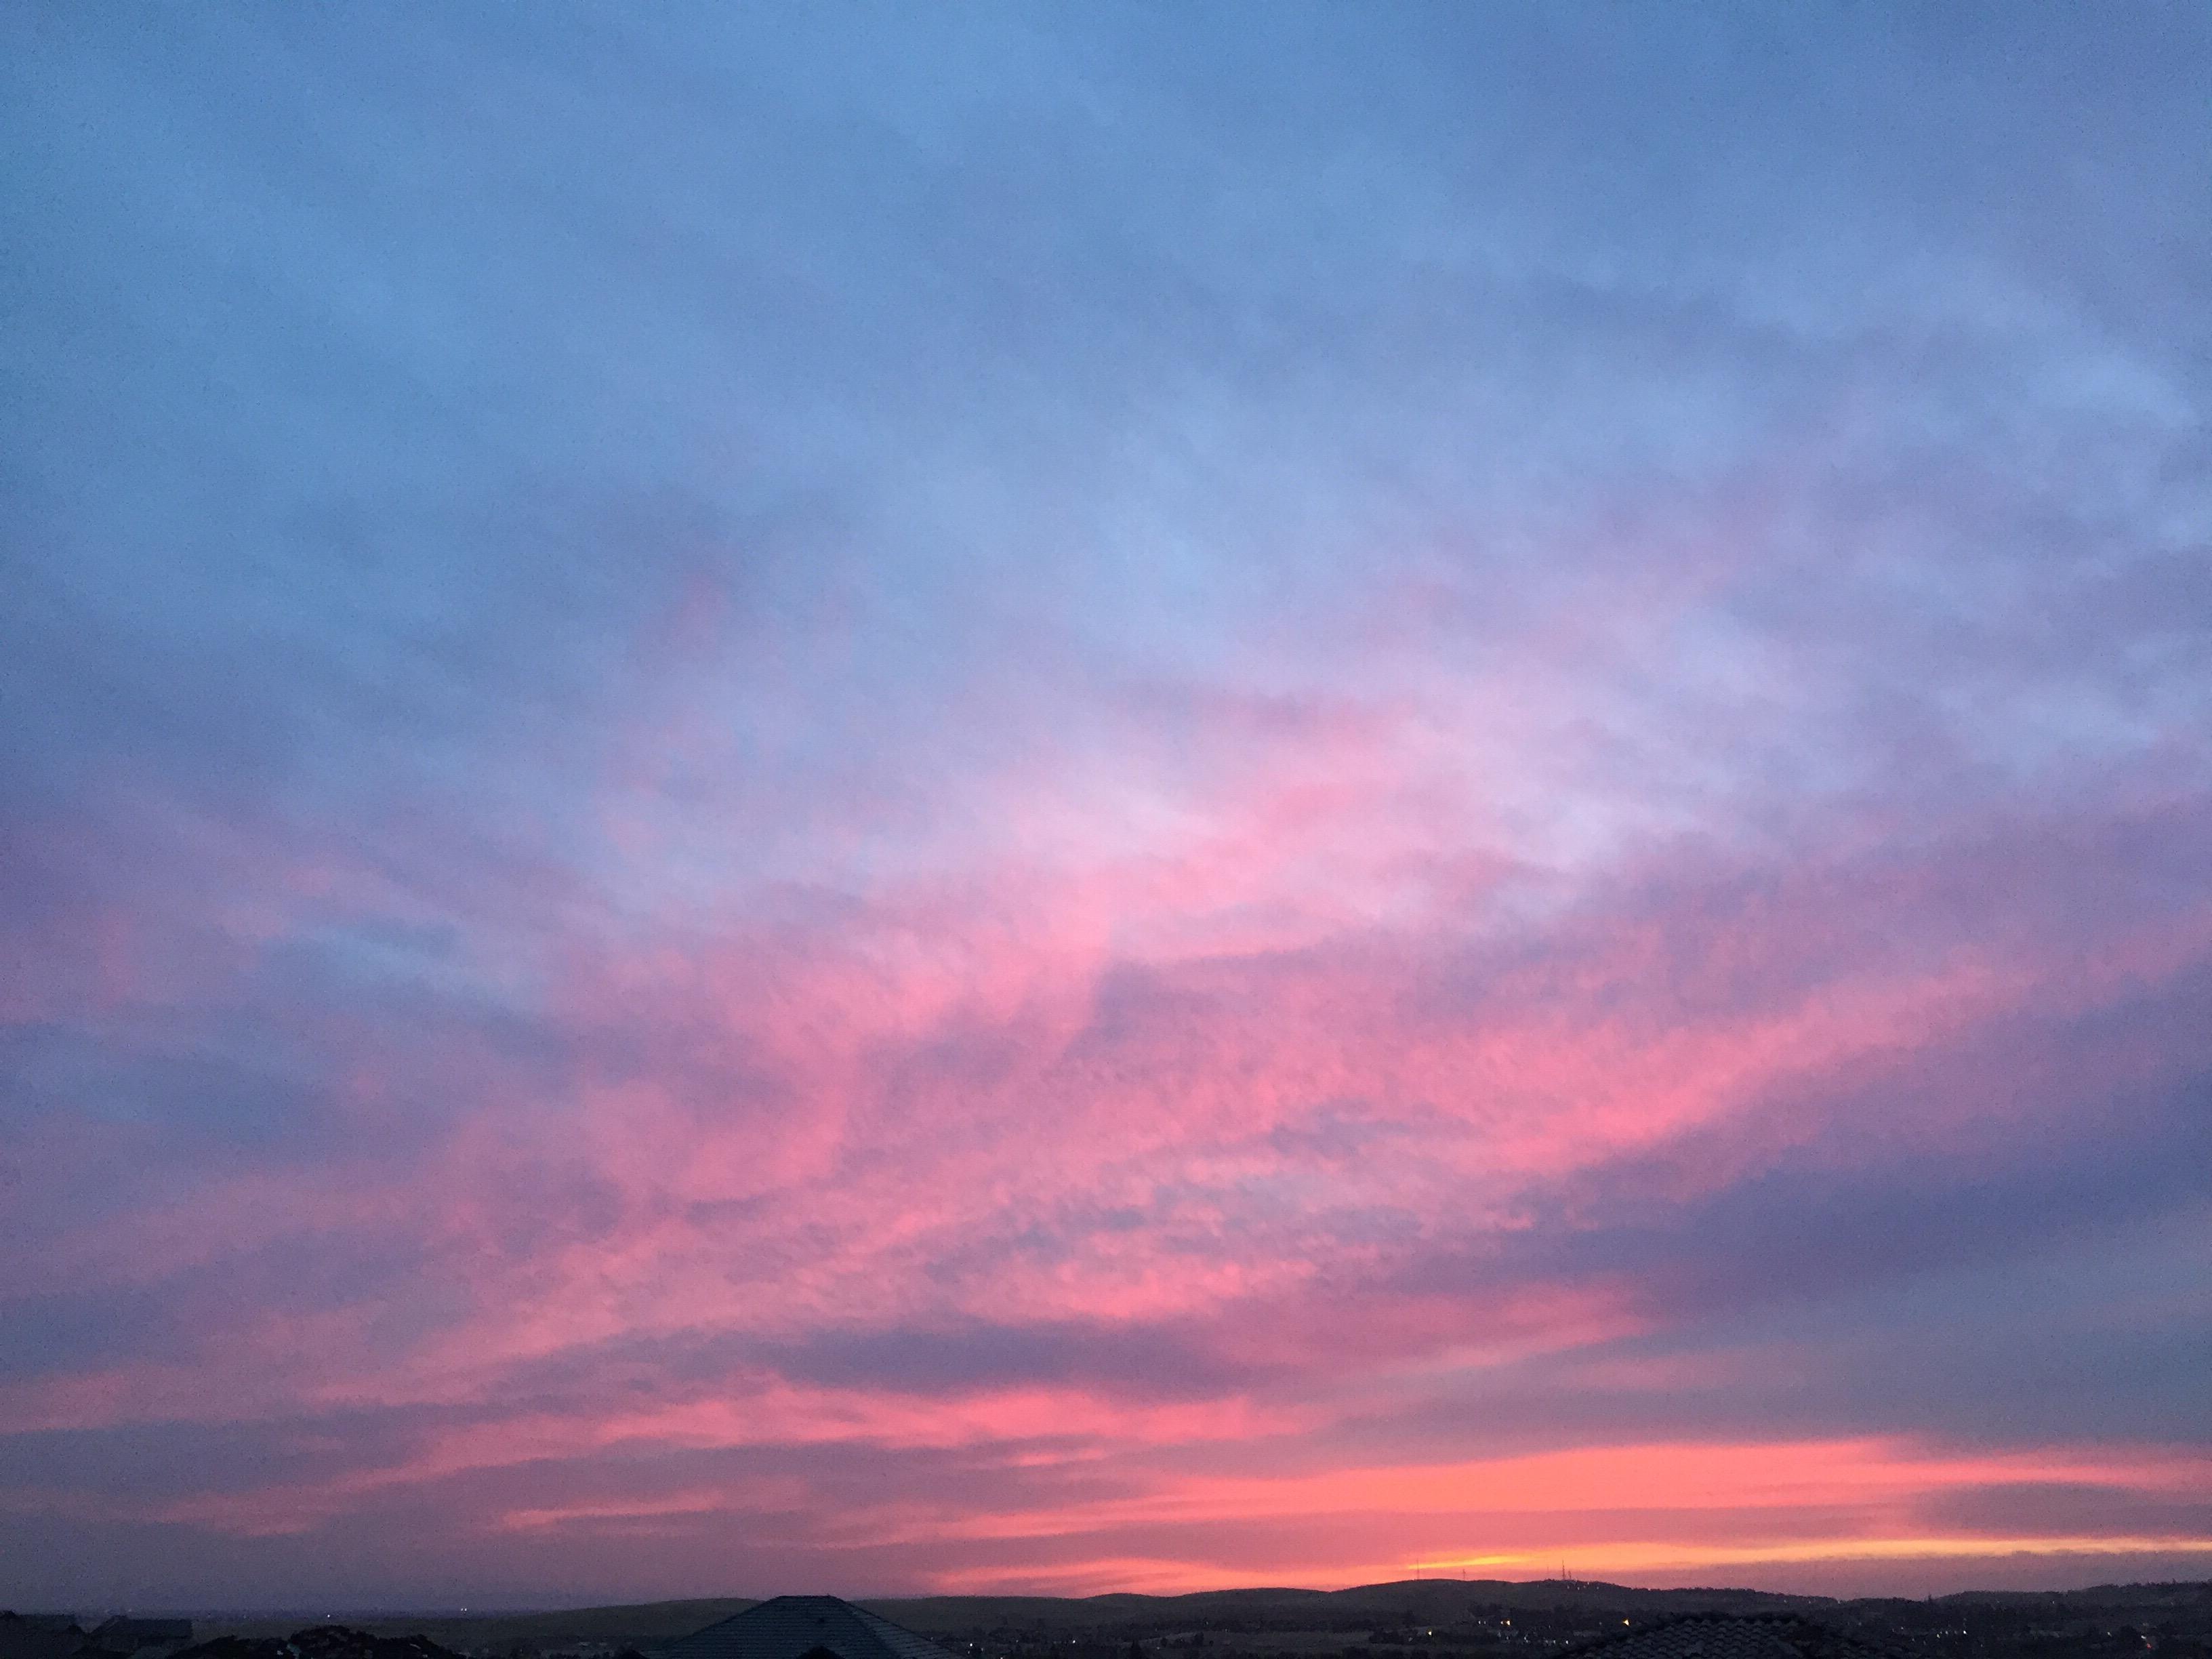 Just before dawn blue sky sunset - El Dorado Sunset